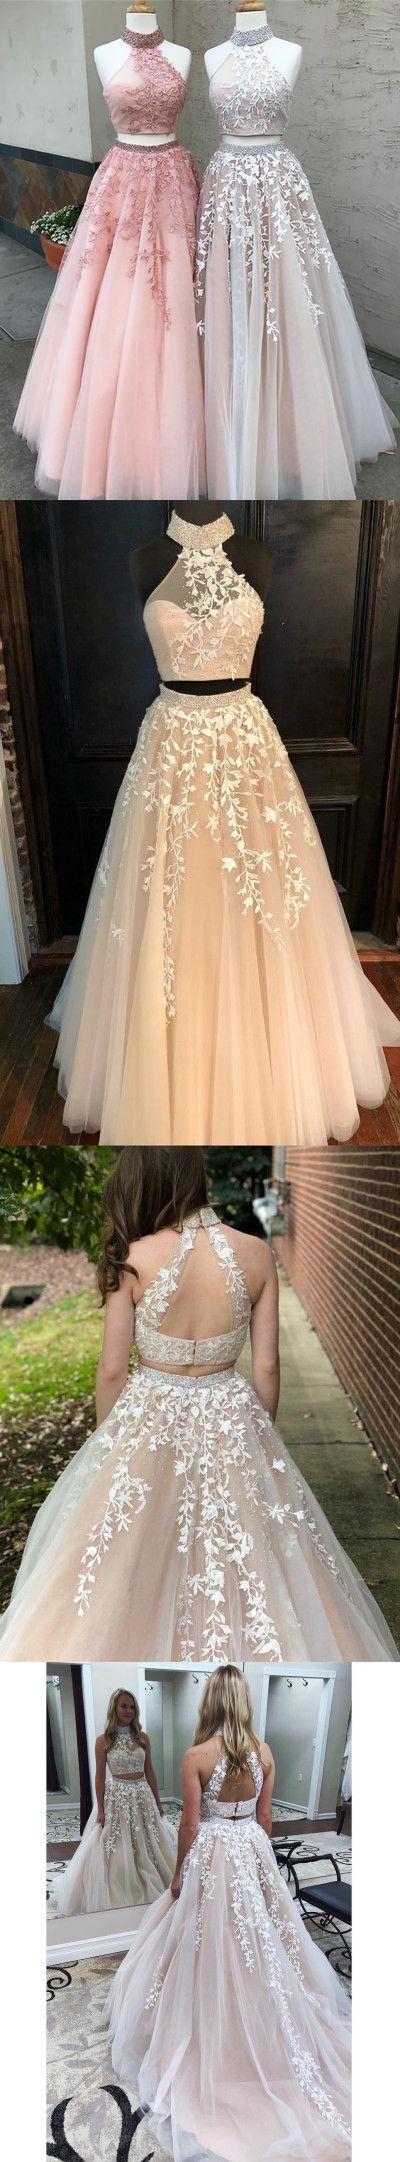 Two Piece Long Prom Dress, Pink Long Prom Dress M2236